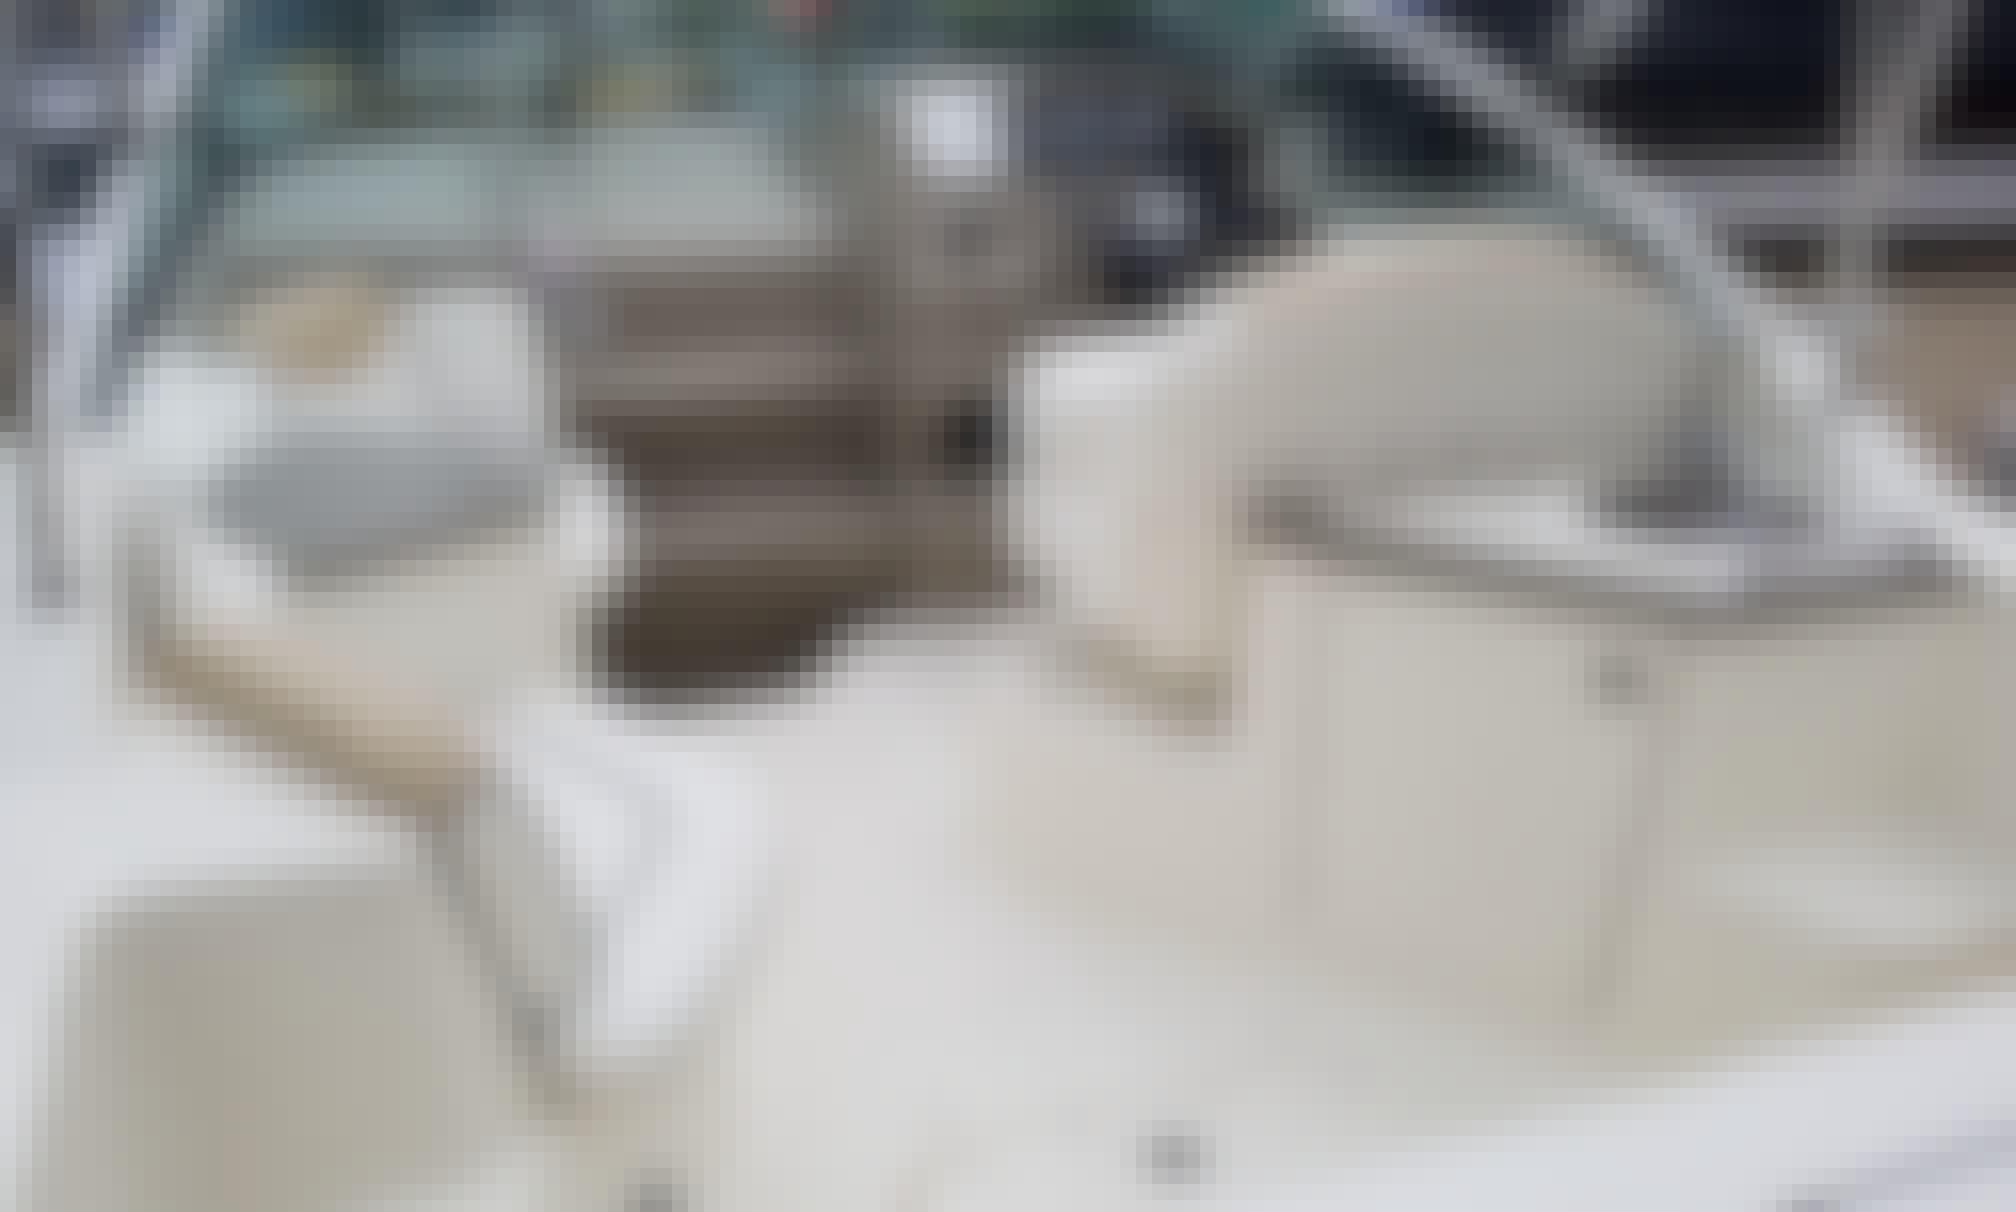 Sea Ray Cruiser Boat Rental in Hammond Indiana